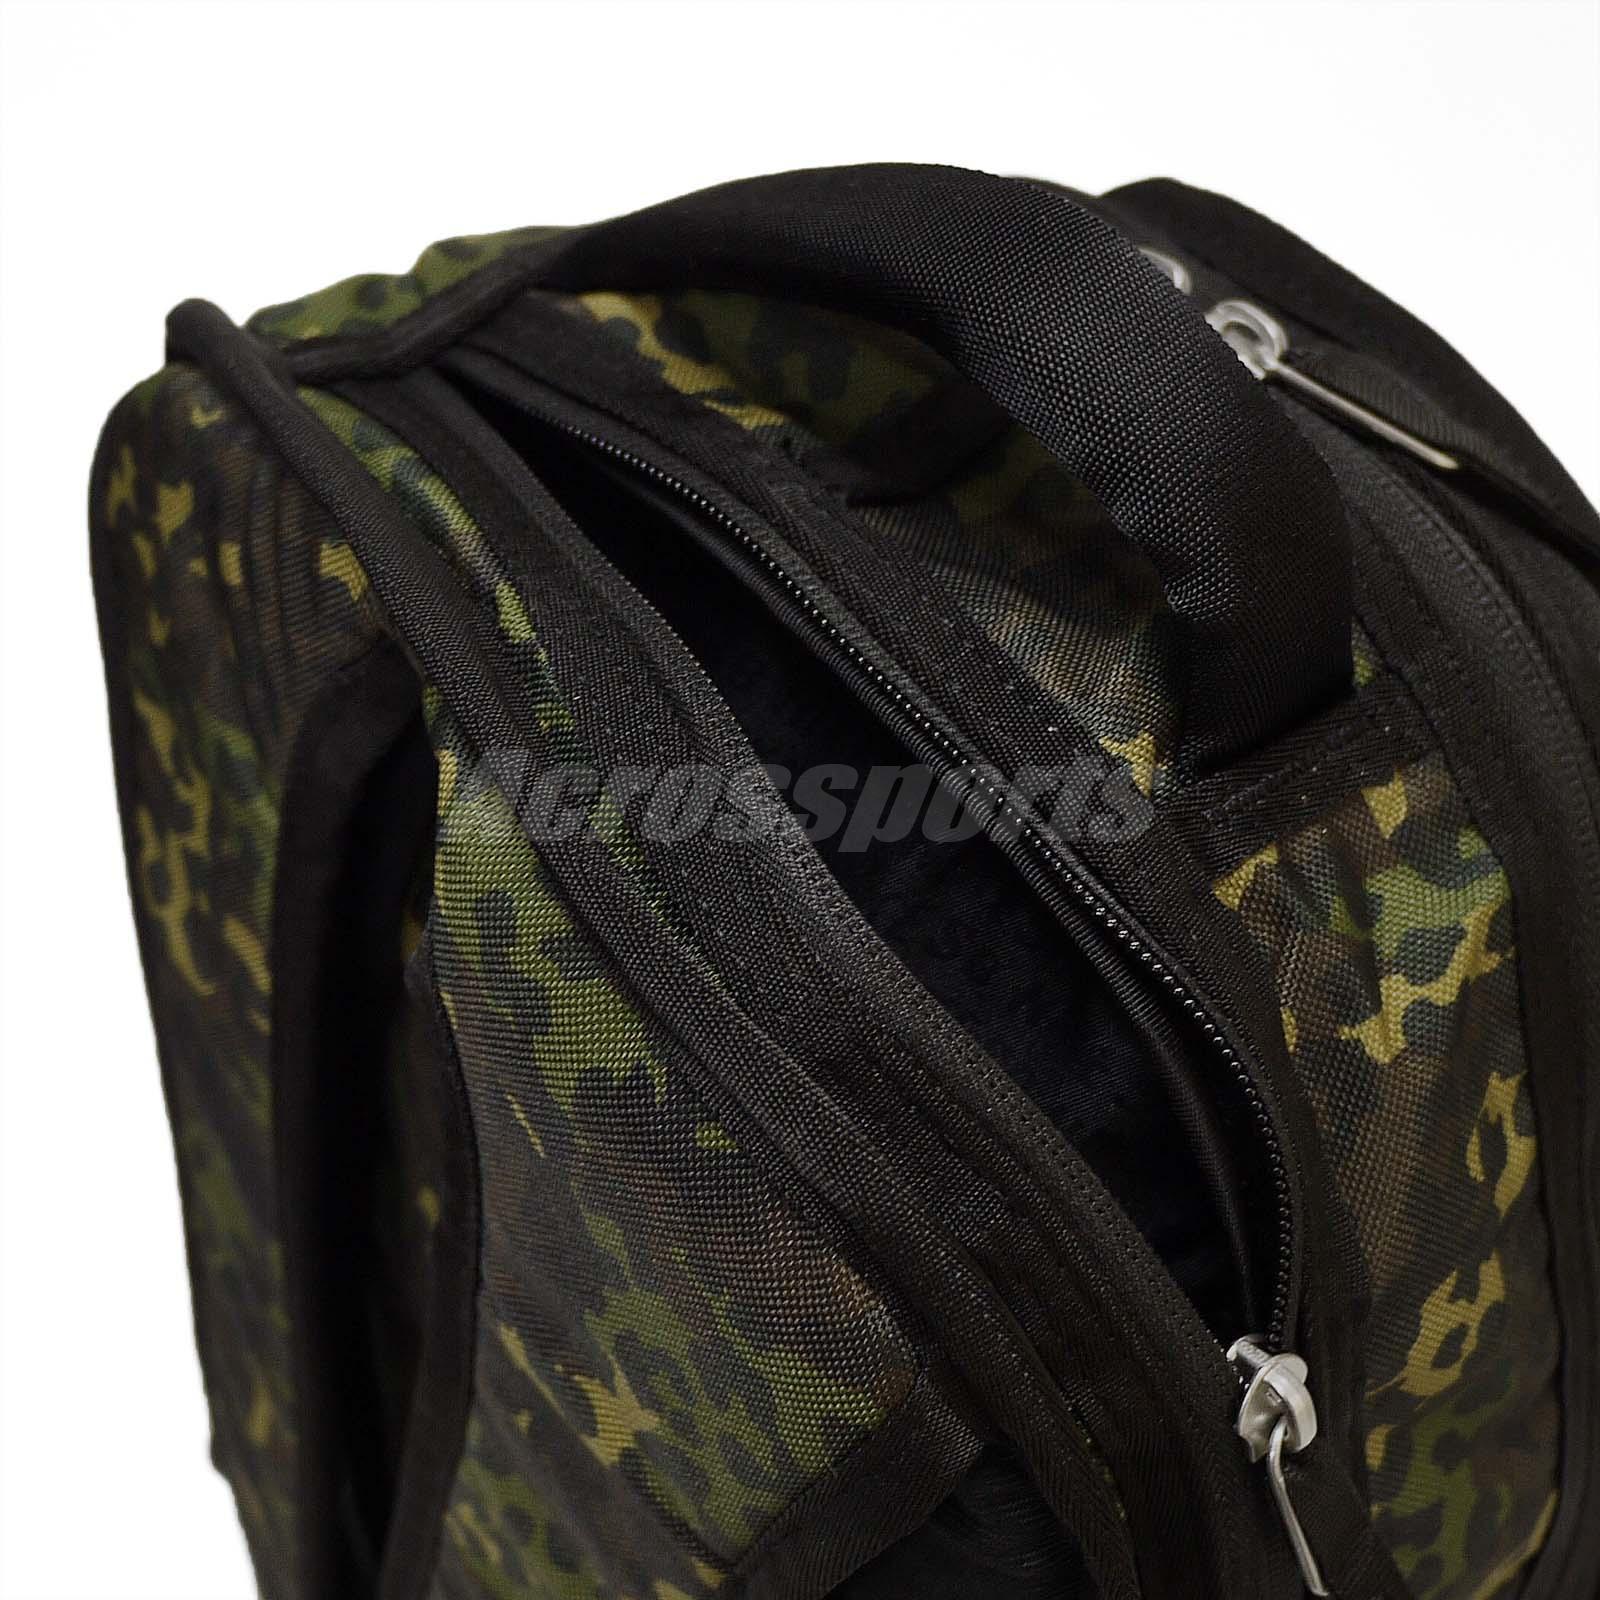 Nike Sb Mochila Rpm Bolsa Camo Verde wk4msps